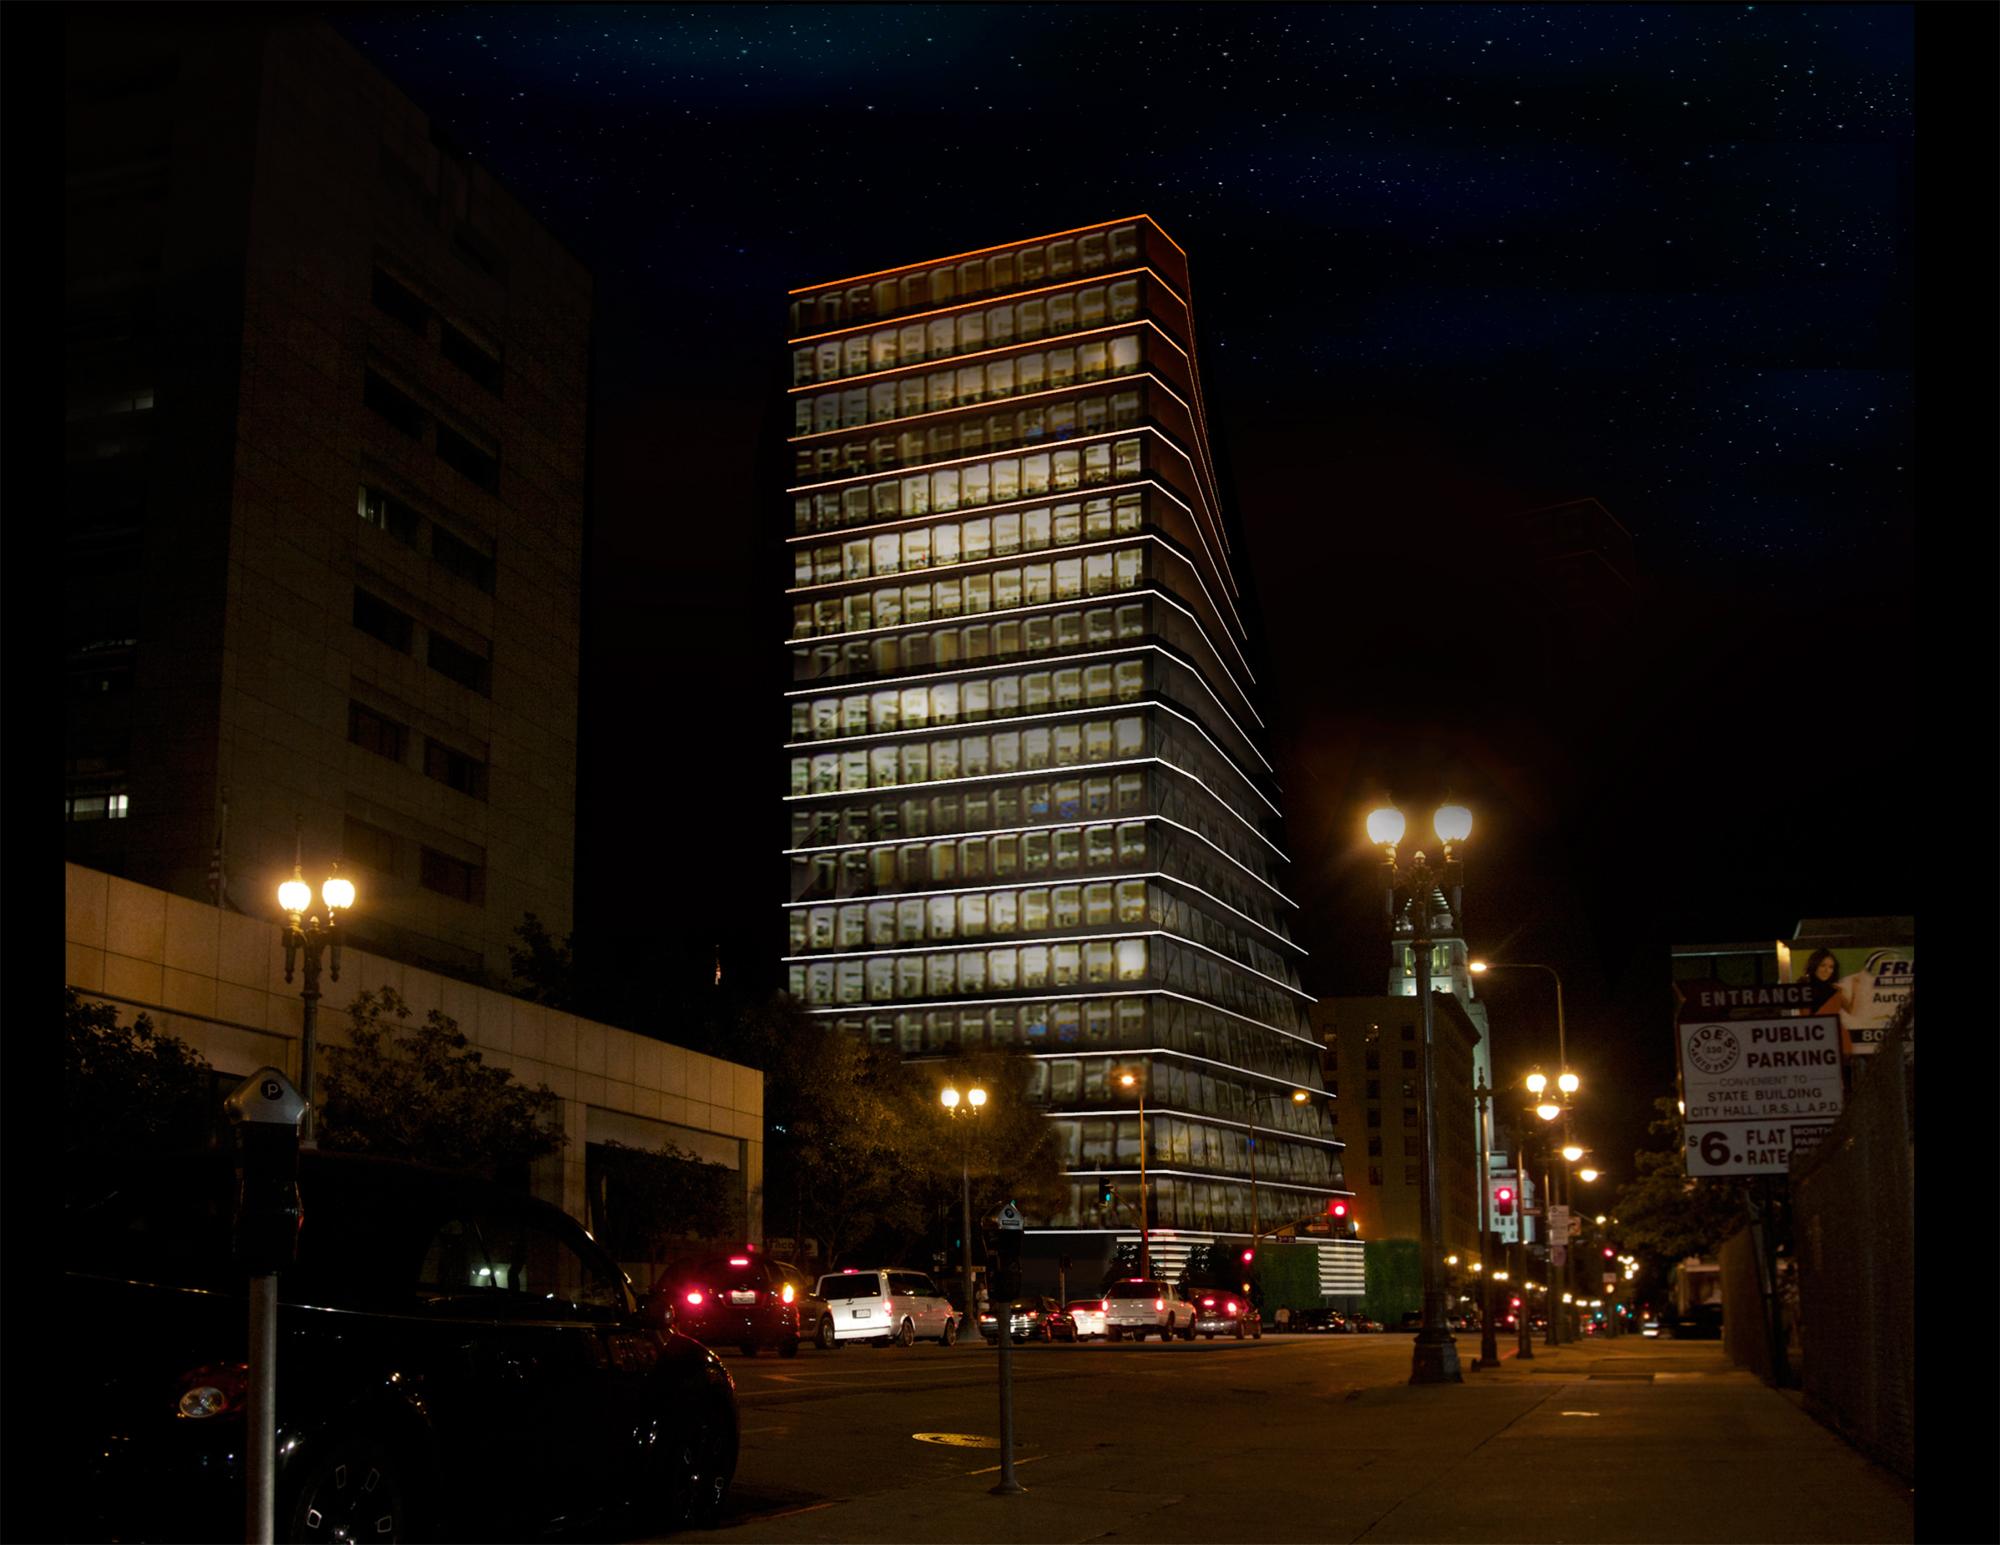 Exterior - Night View